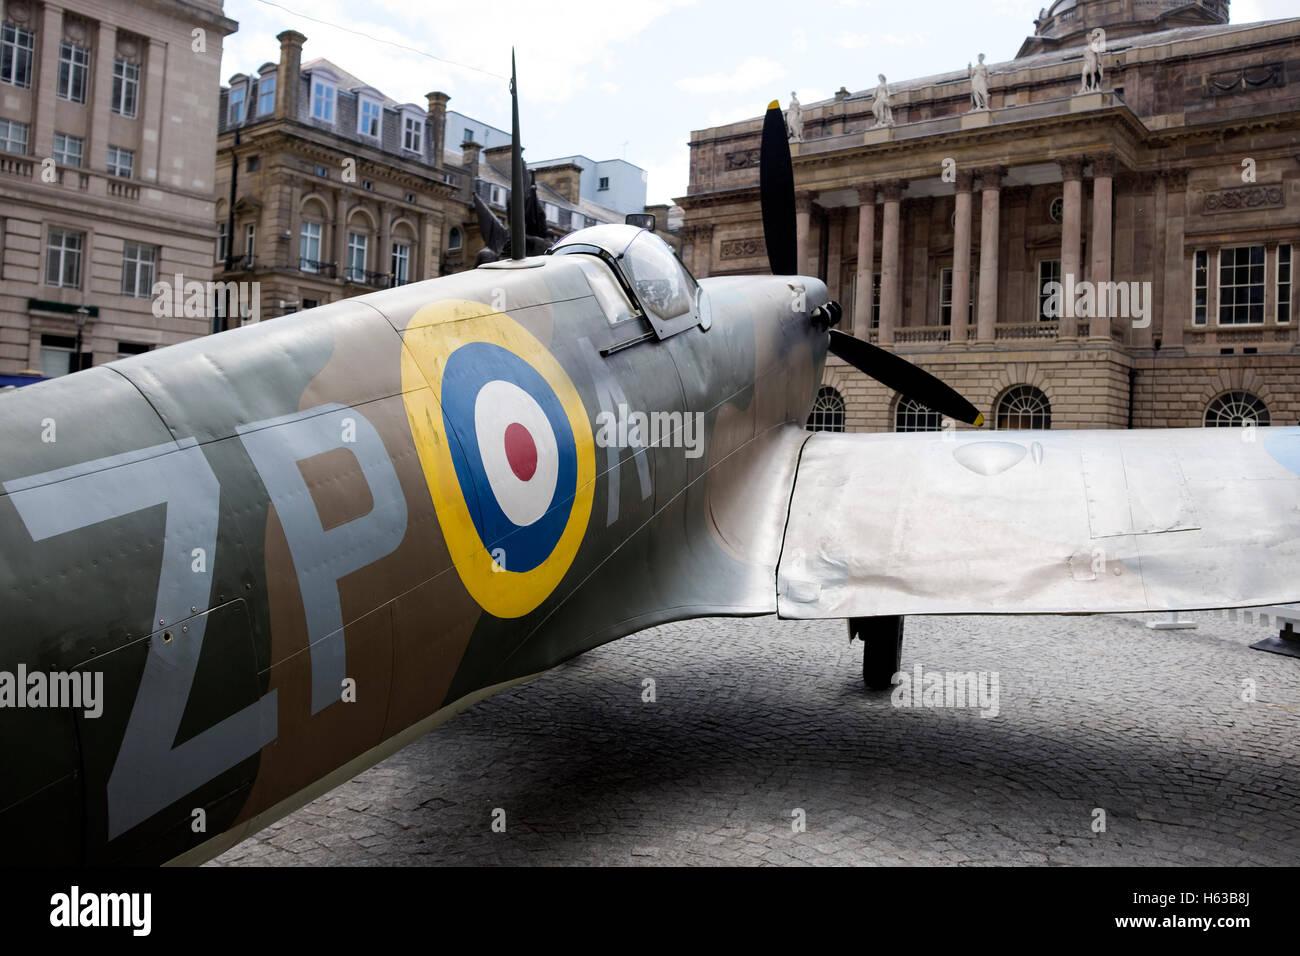 Old Spitfire Plane - Stock Image